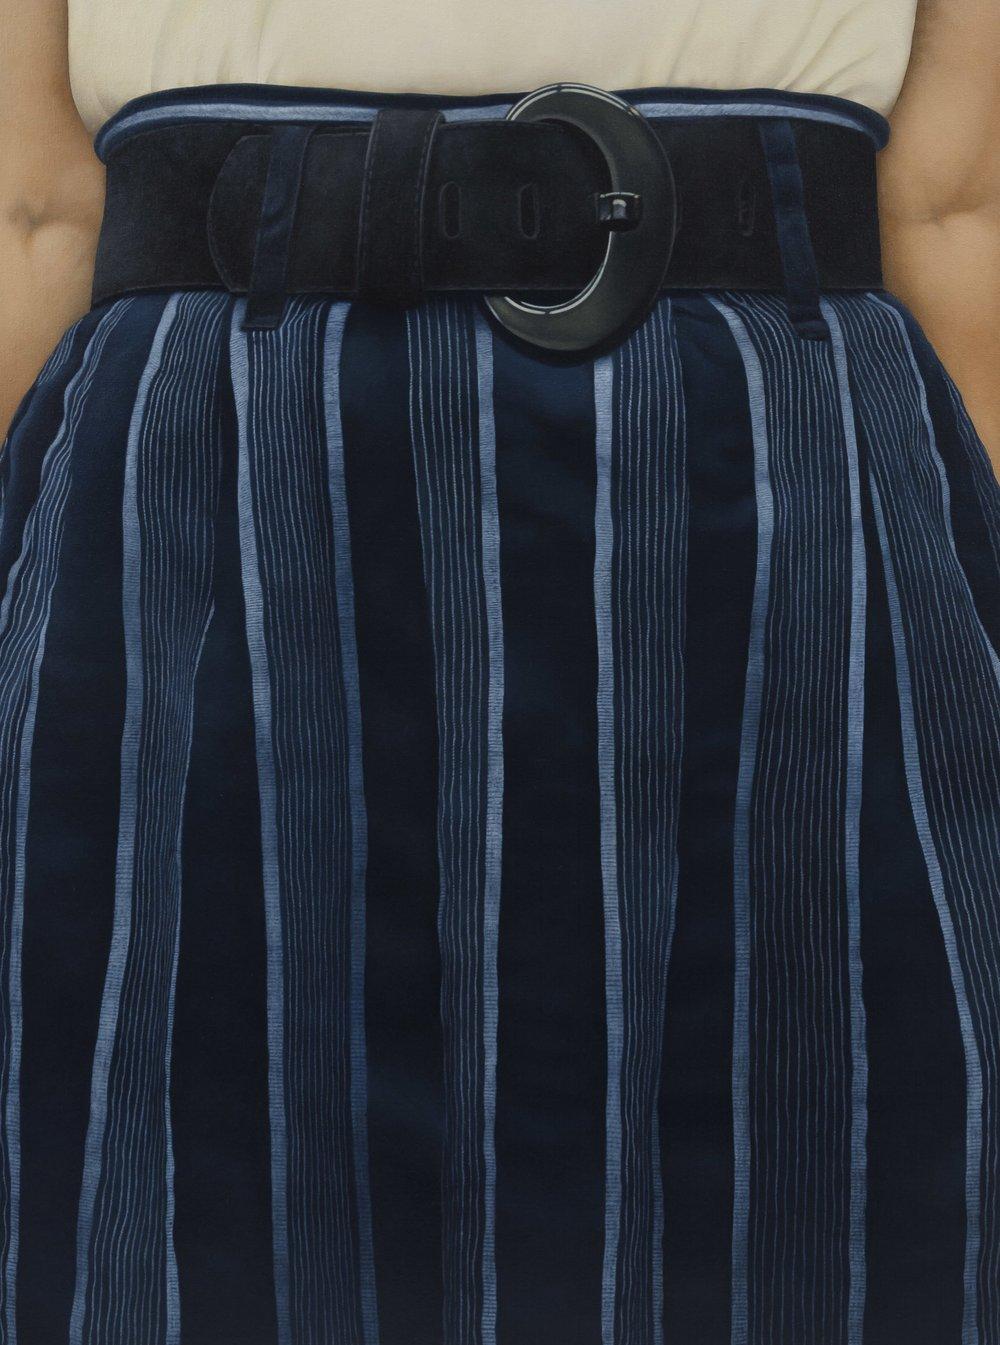 Untitled (Skirt and Belt).jpg